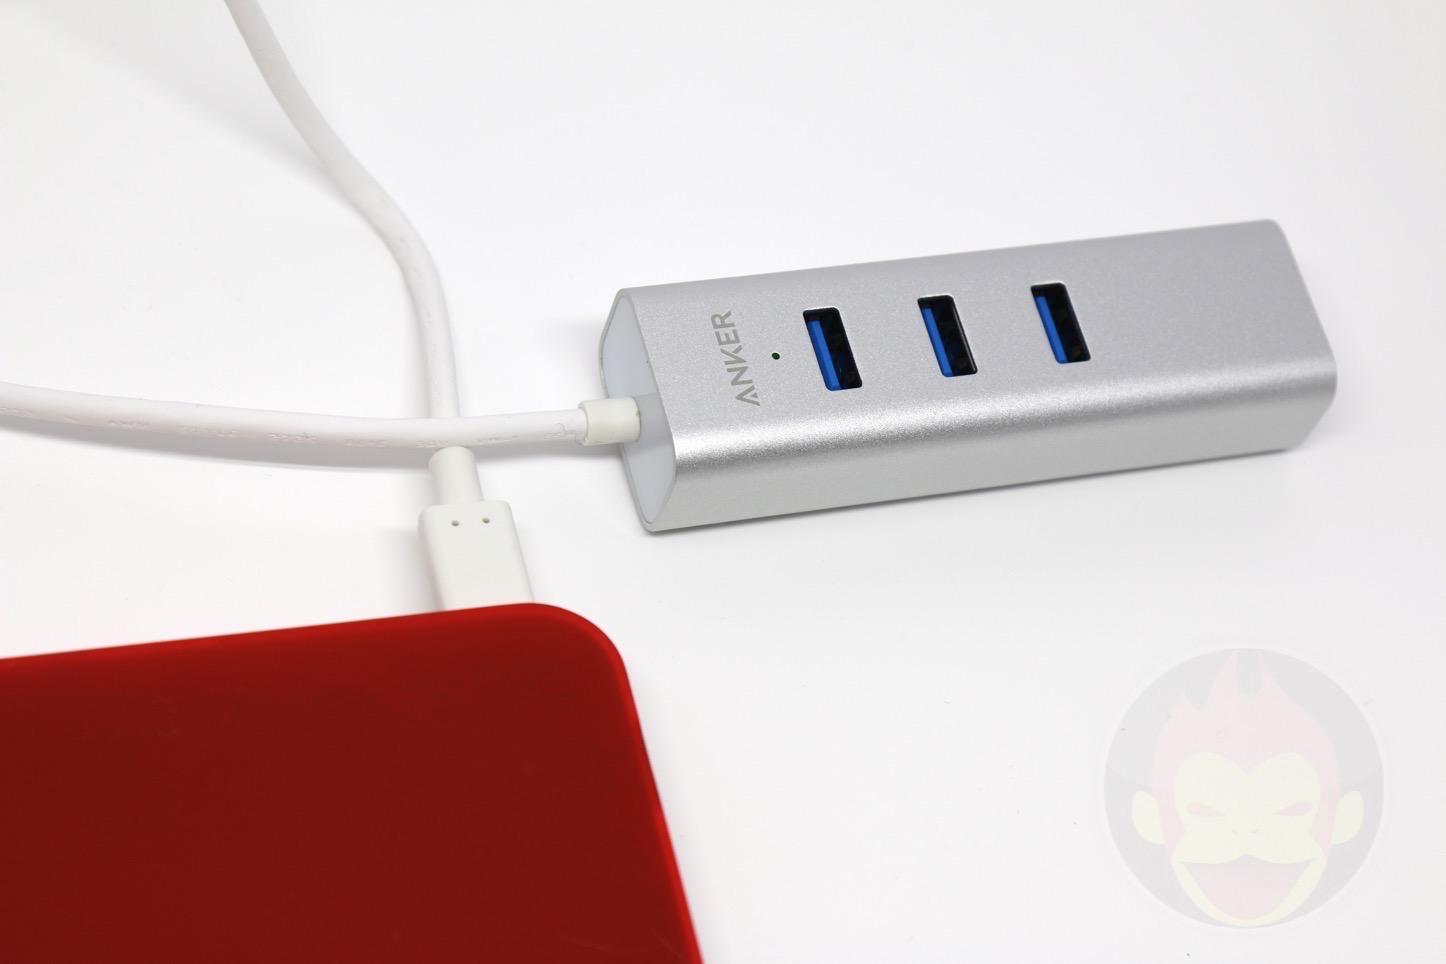 Anker-USB-C-Ethernet-Cable-07.jpg